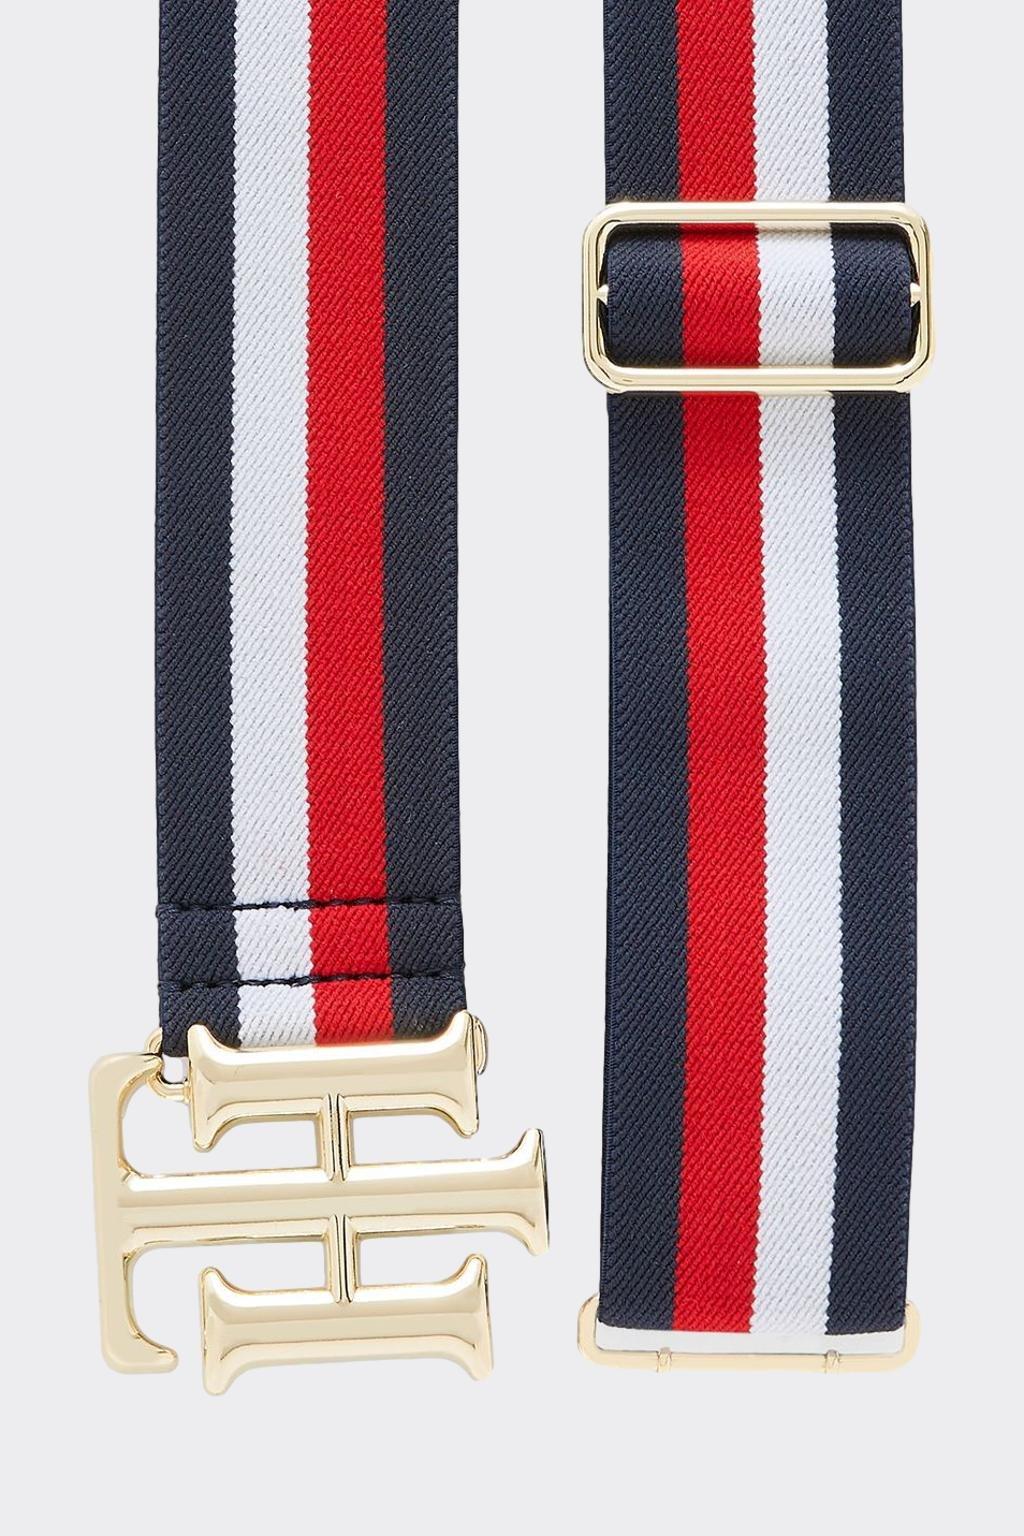 Tommy Hilfiger dámký pásek elastický - červená, bílá, modrá